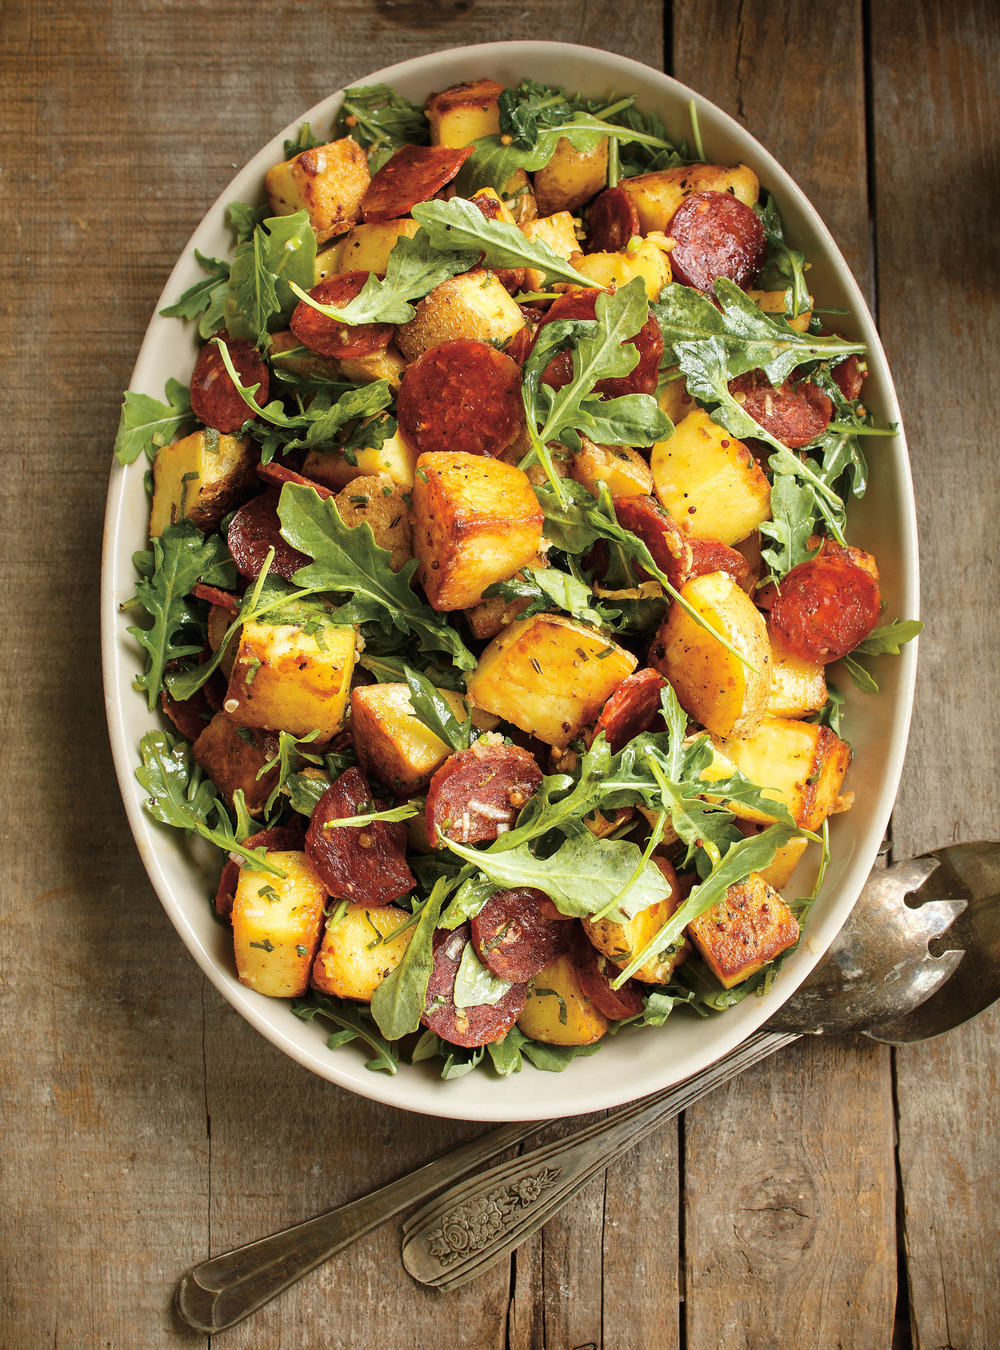 Salade de pommes de terre grill es ricardo for Articles de cuisine de ricardo